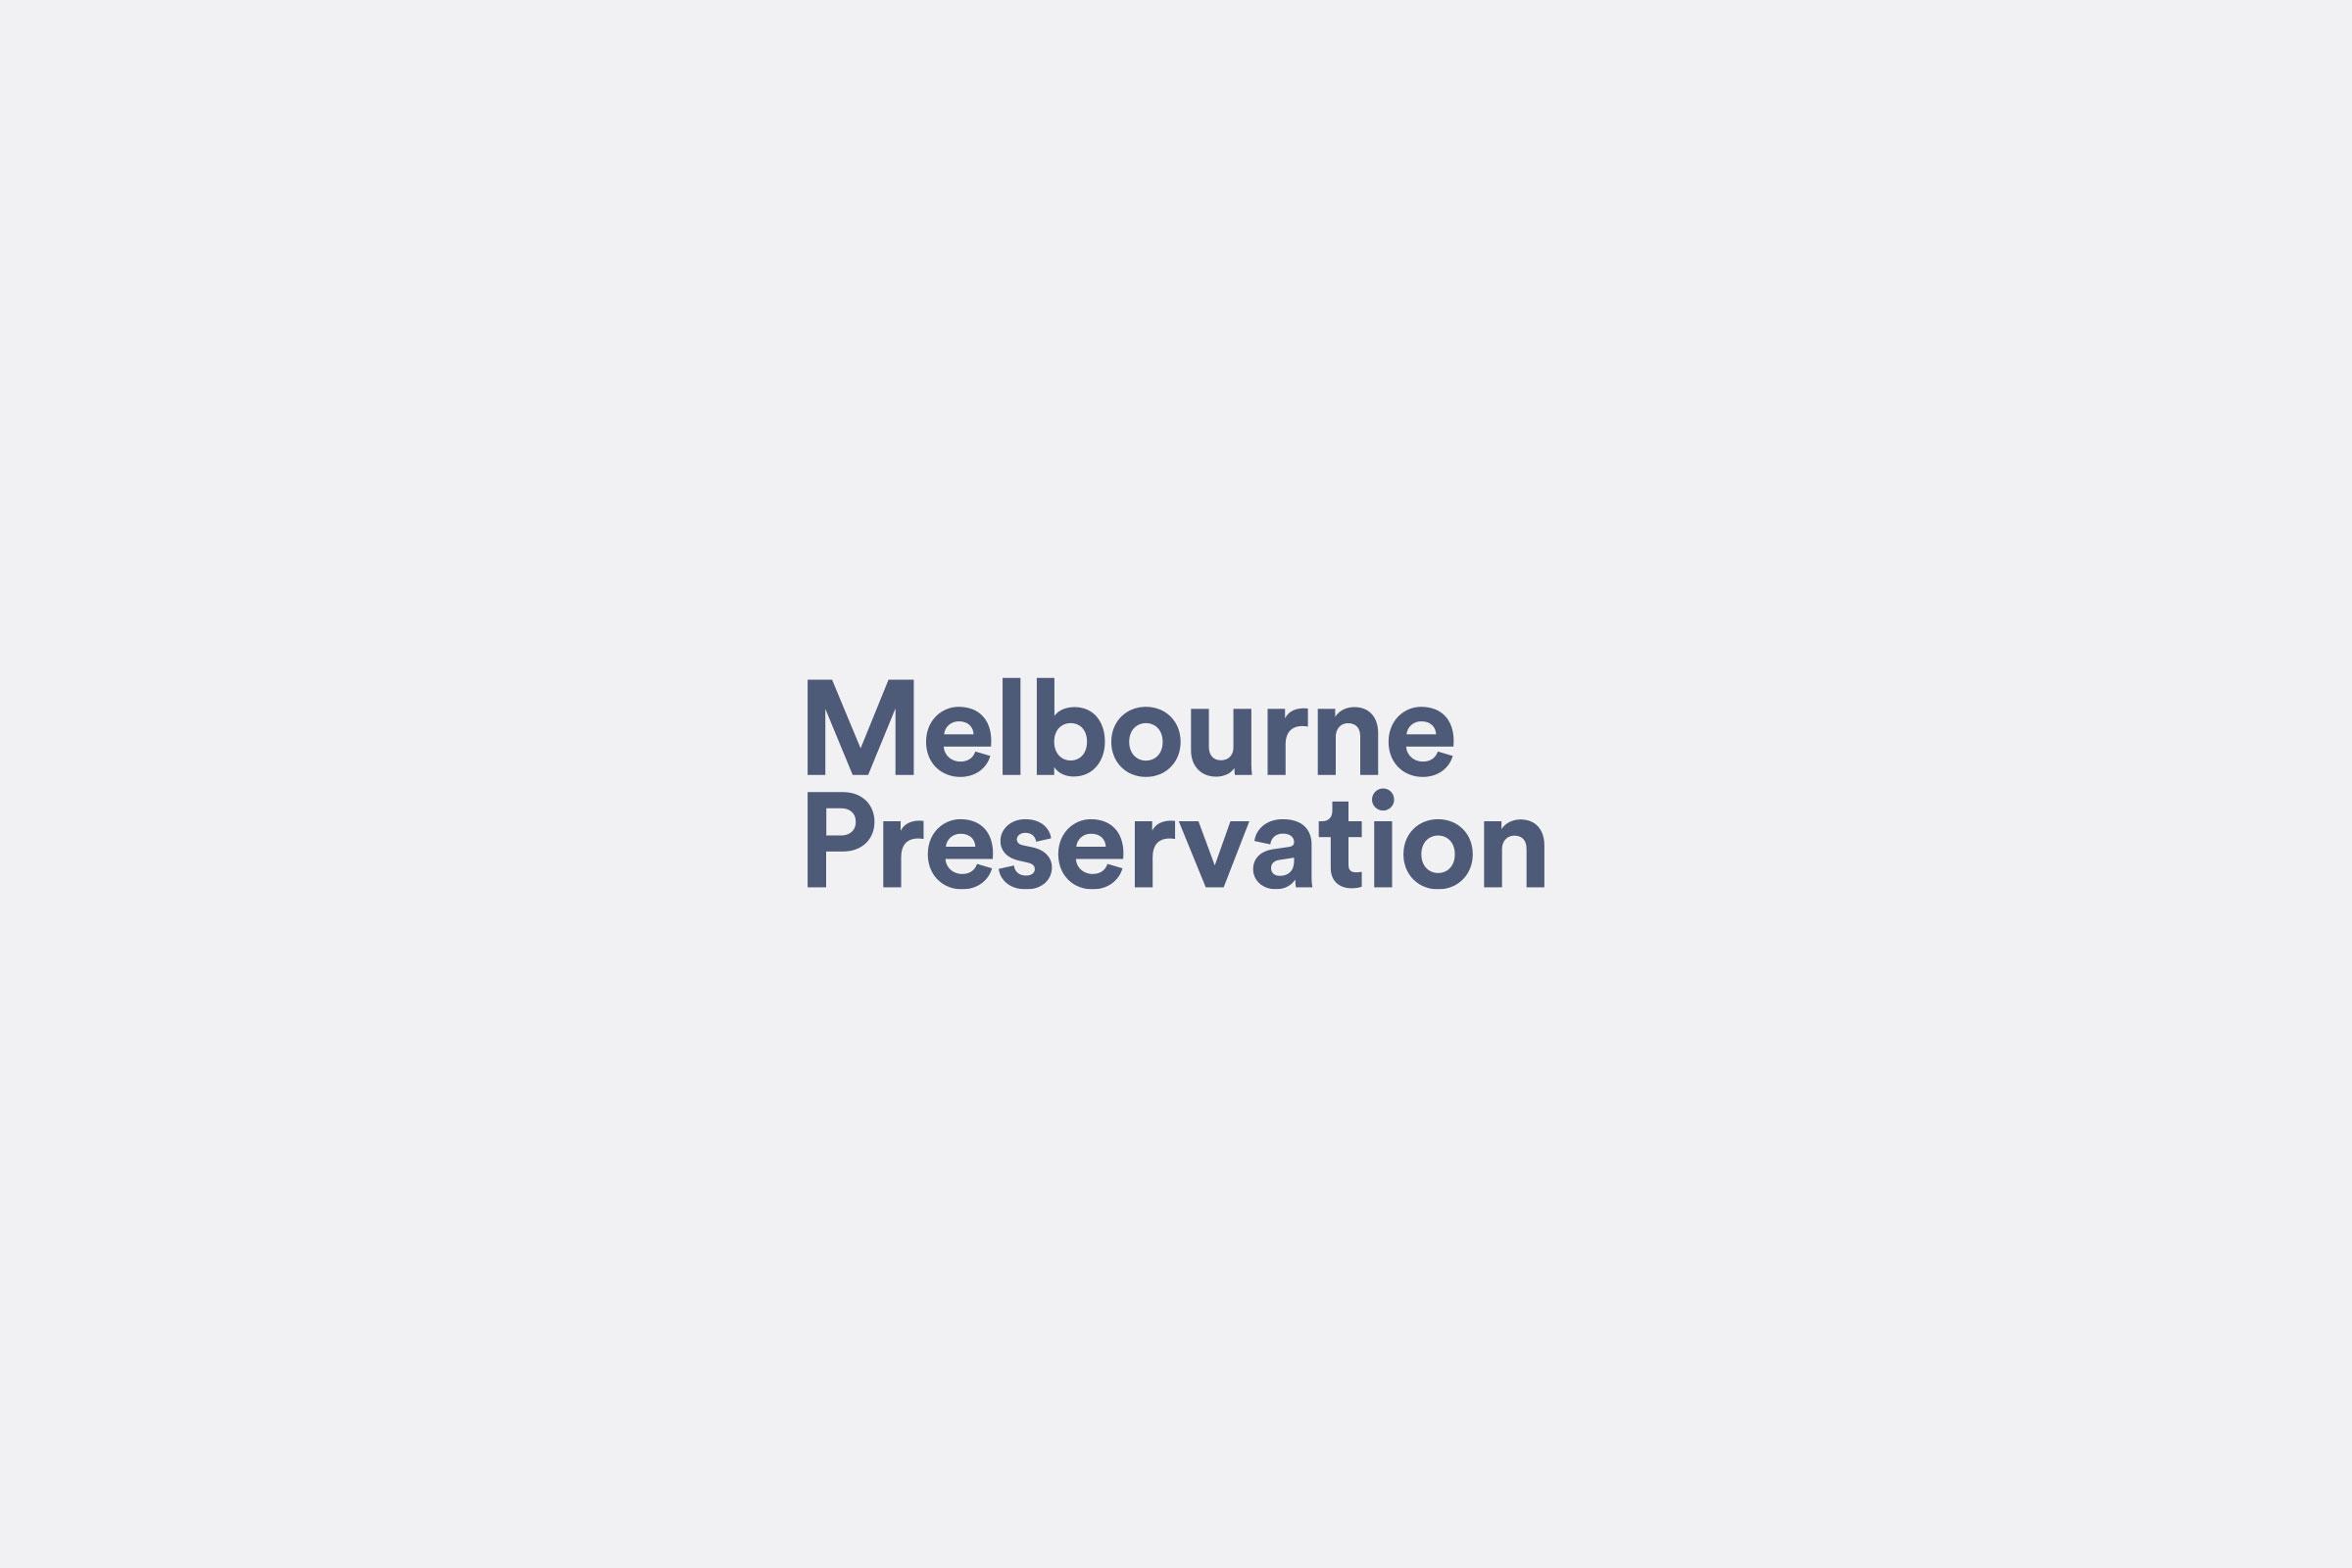 Melbourne Preservation  Brand identity